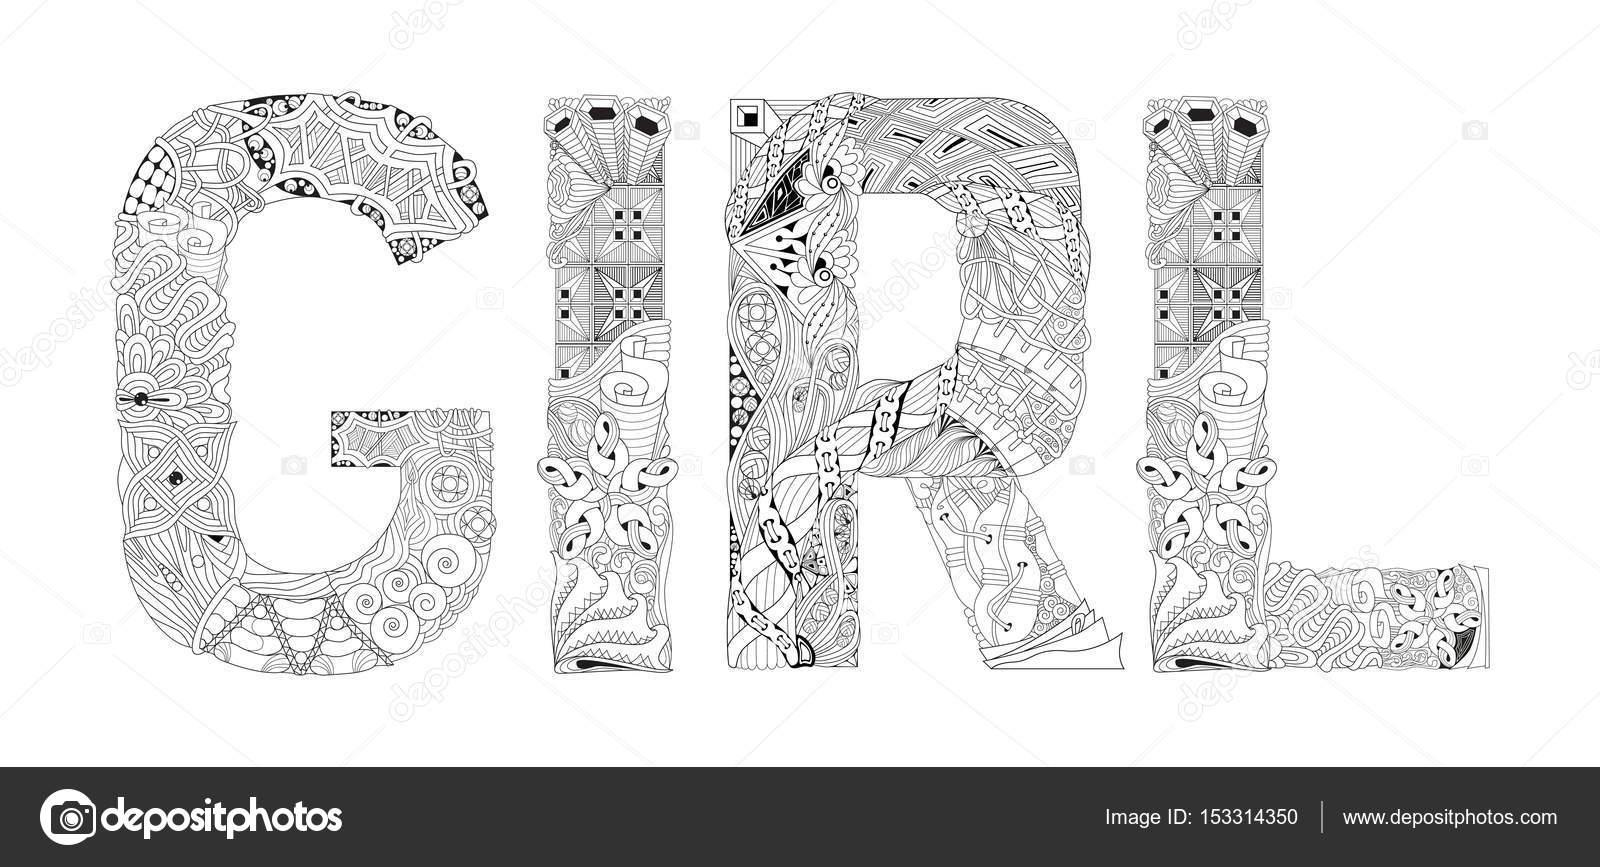 wordgirl coloring pages | Palabra de chica para colorear. Objeto de zentangle ...